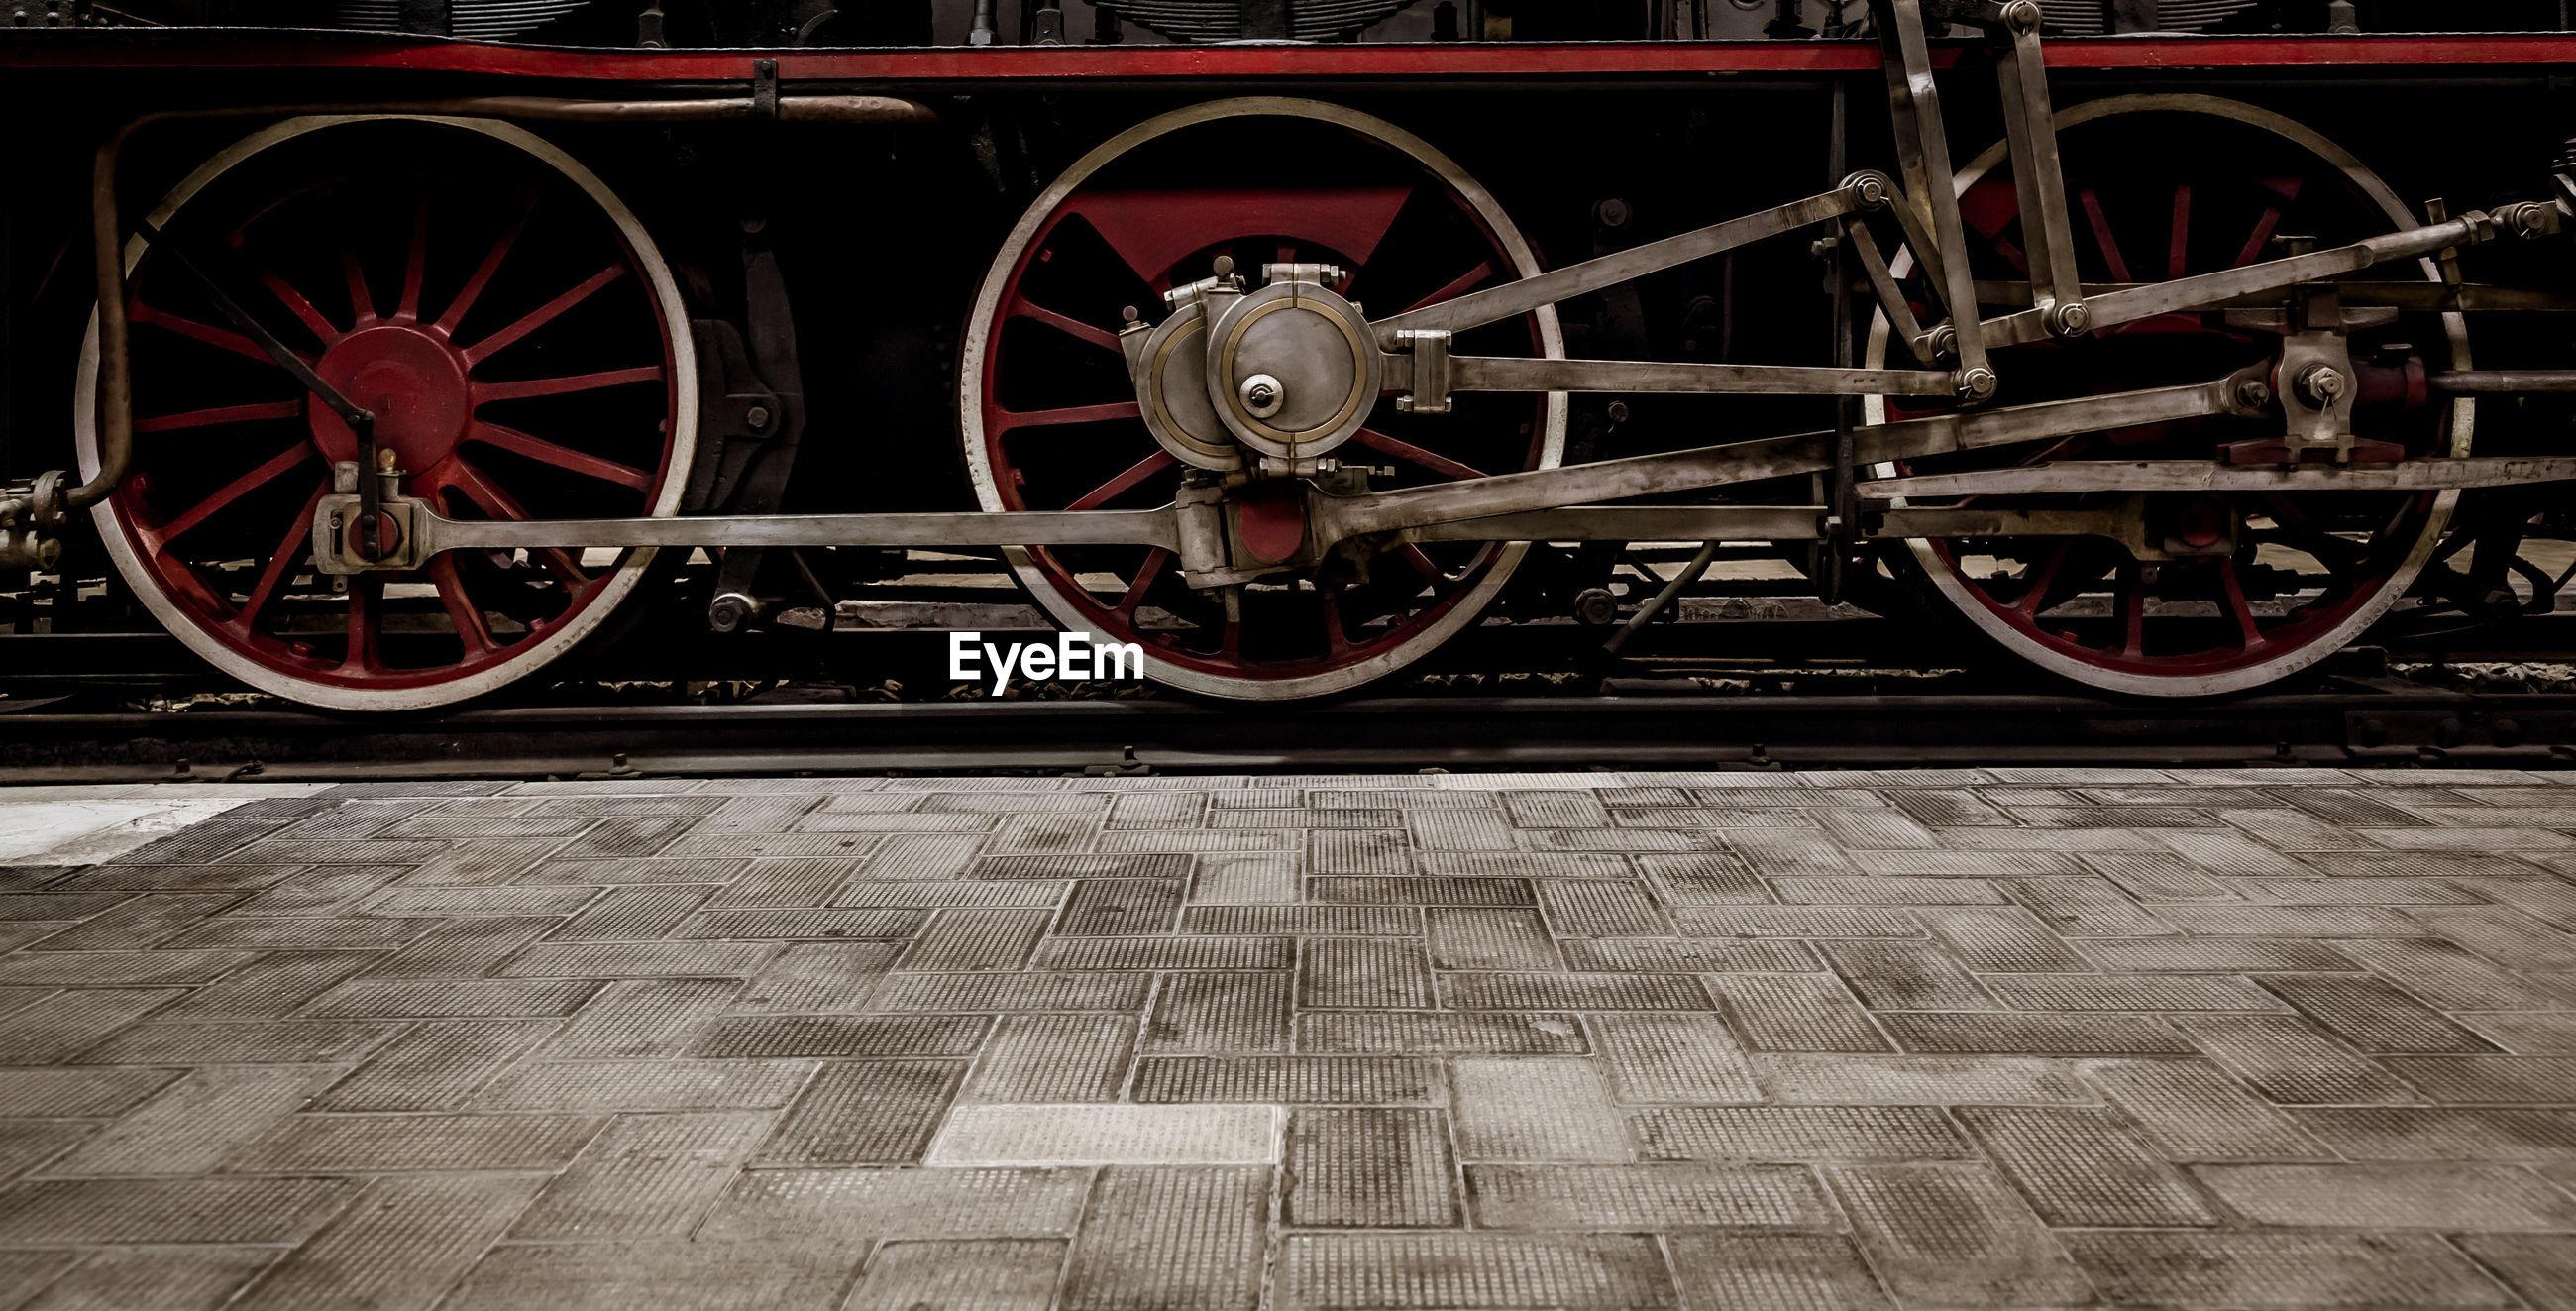 Close-up of train wheel on railroad track